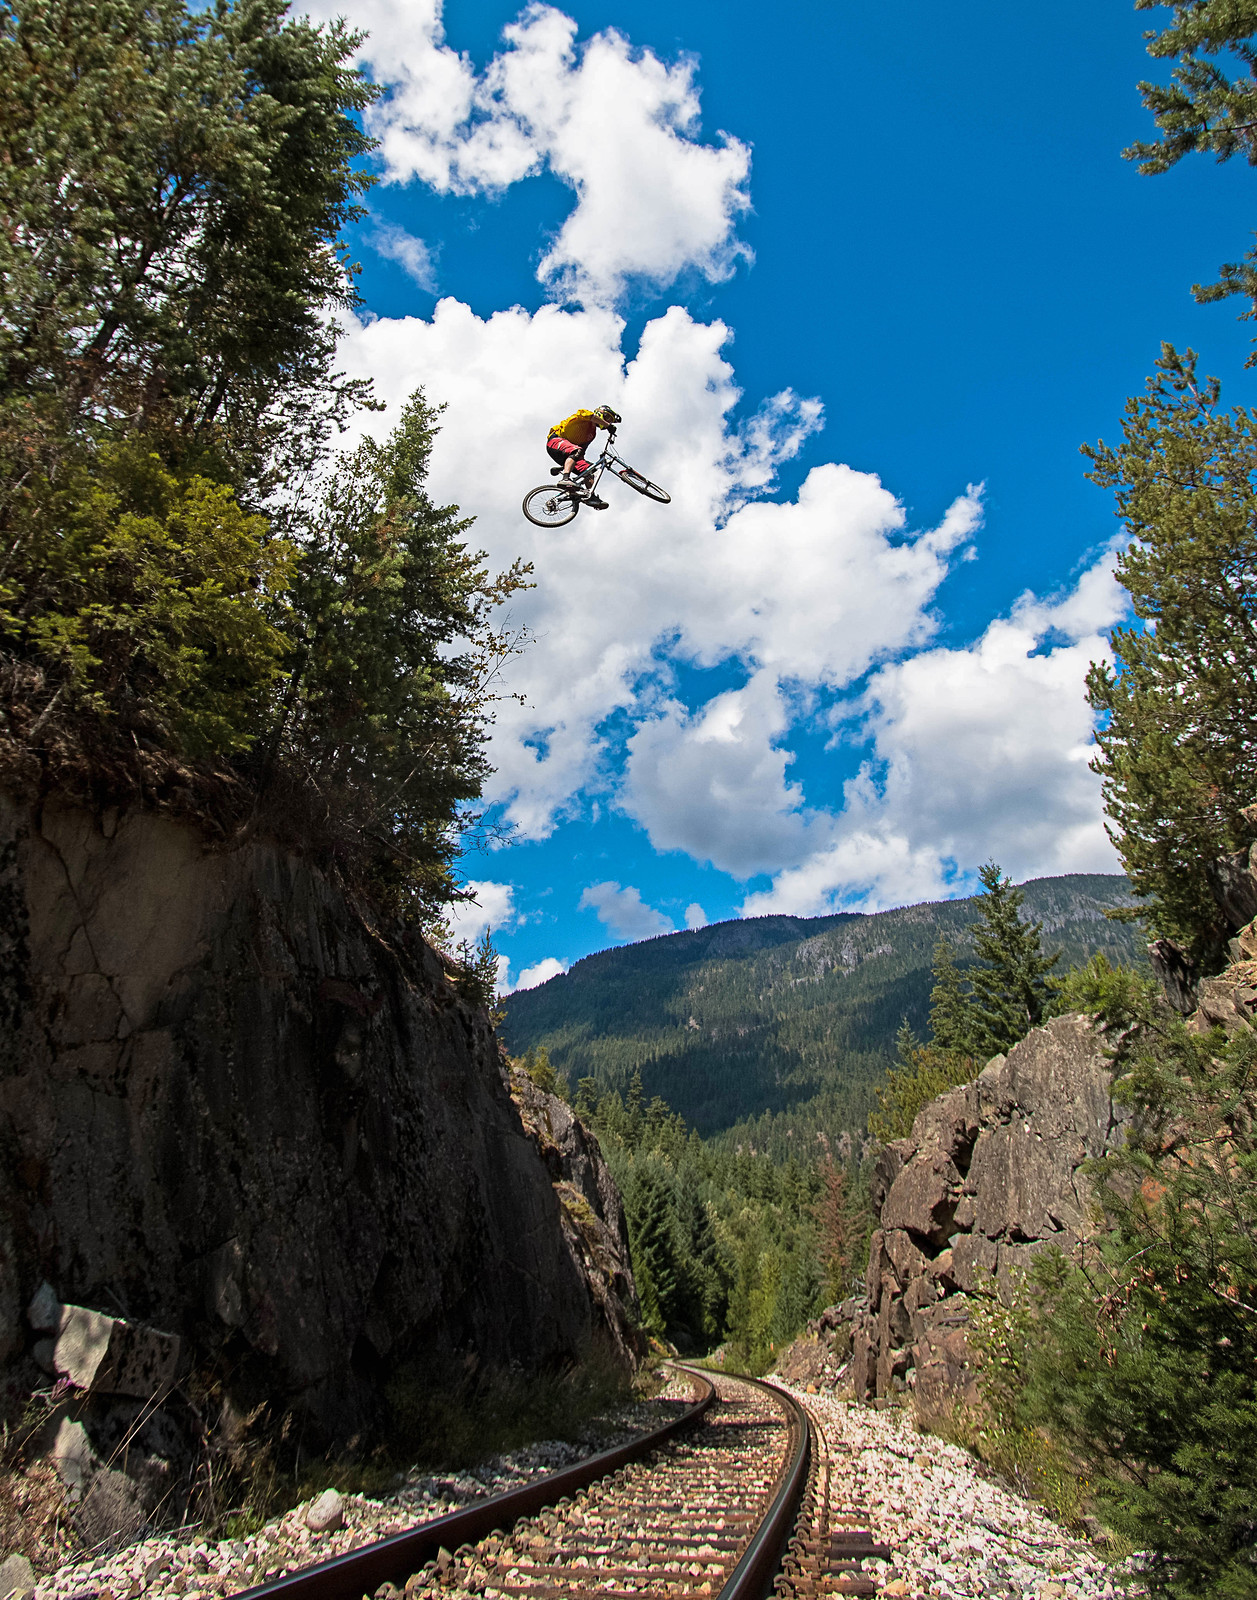 IMG 5118 - DC11 - Mountain Biking Pictures - Vital MTB